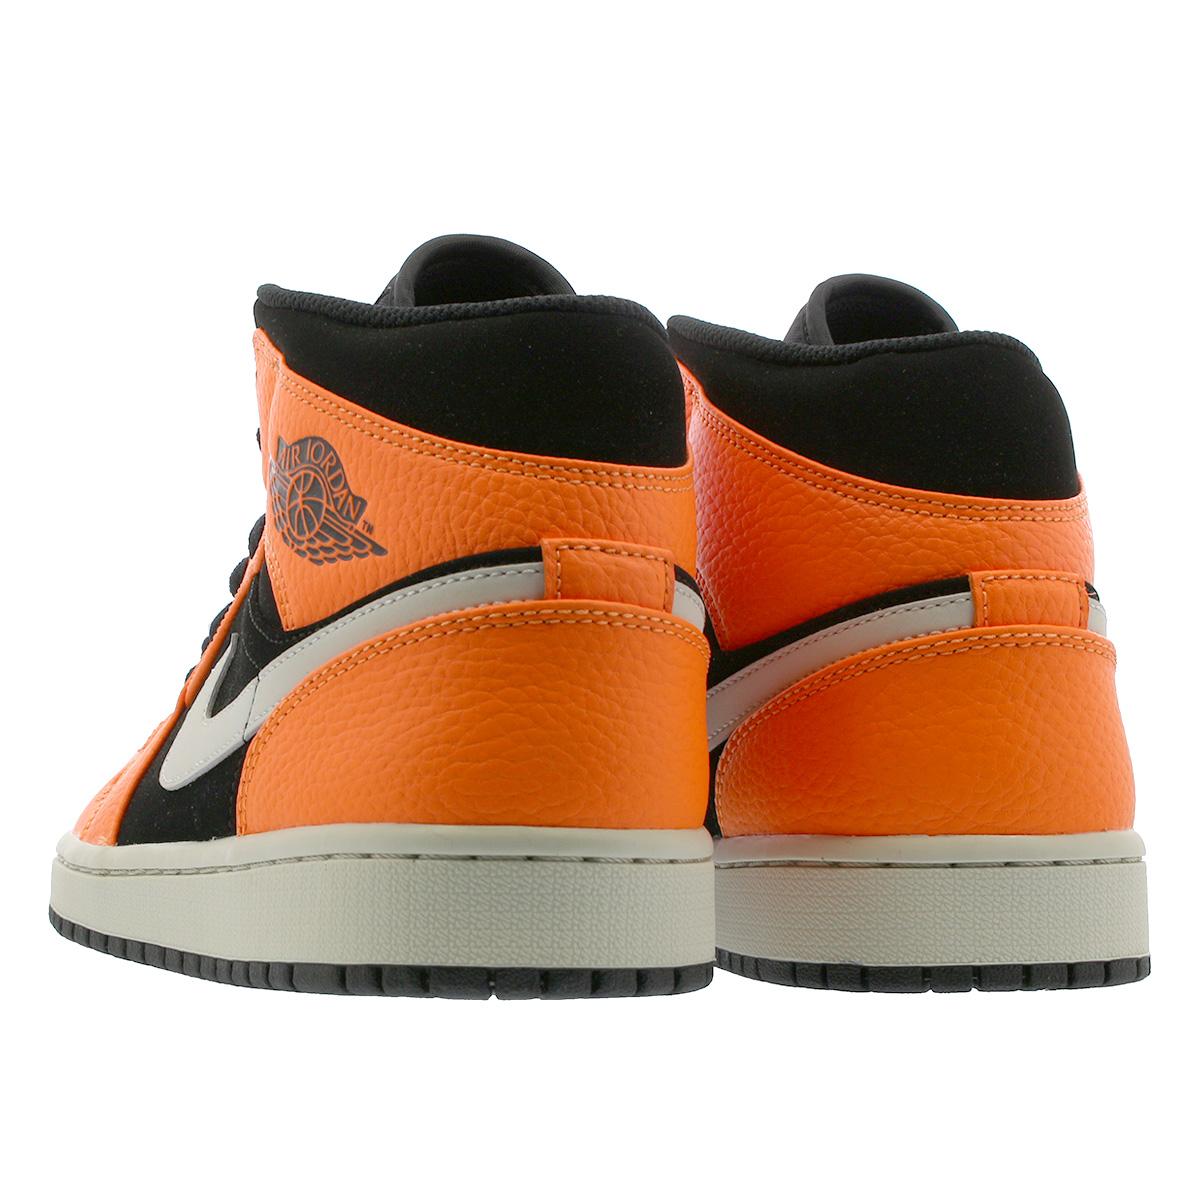 b88e52ff8d8 NIKE AIR JORDAN 1 MID Nike Air Jordan 1 mid BLACK CONE LIGHT BONE ORANGE  554